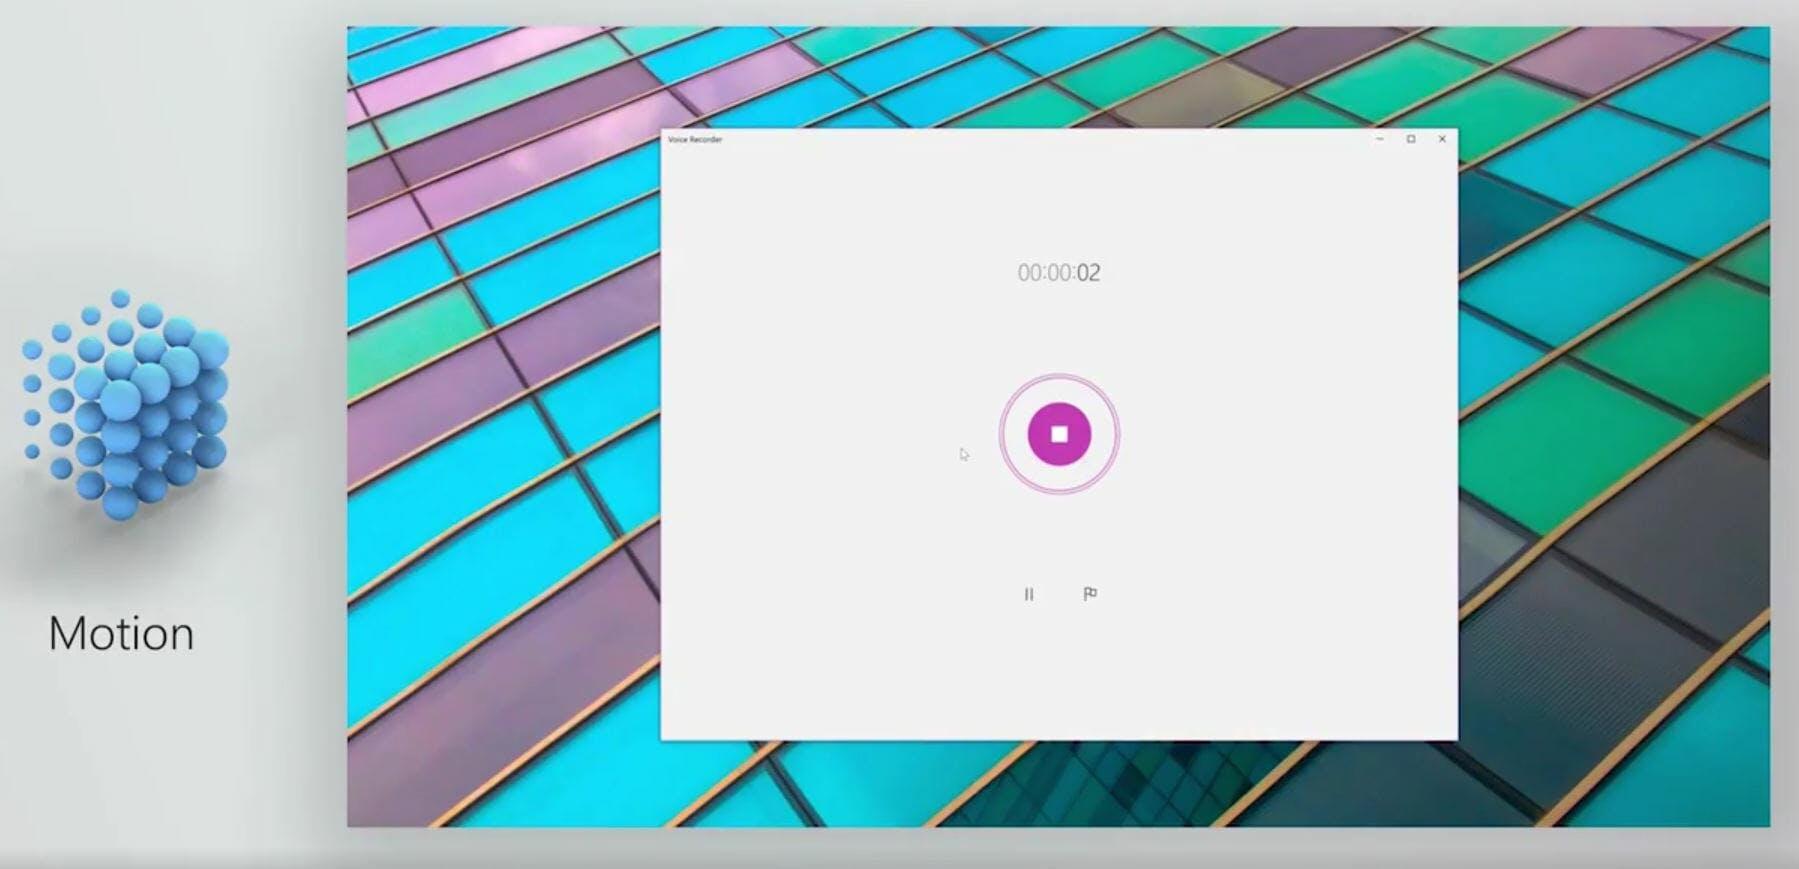 microsoft interface design language